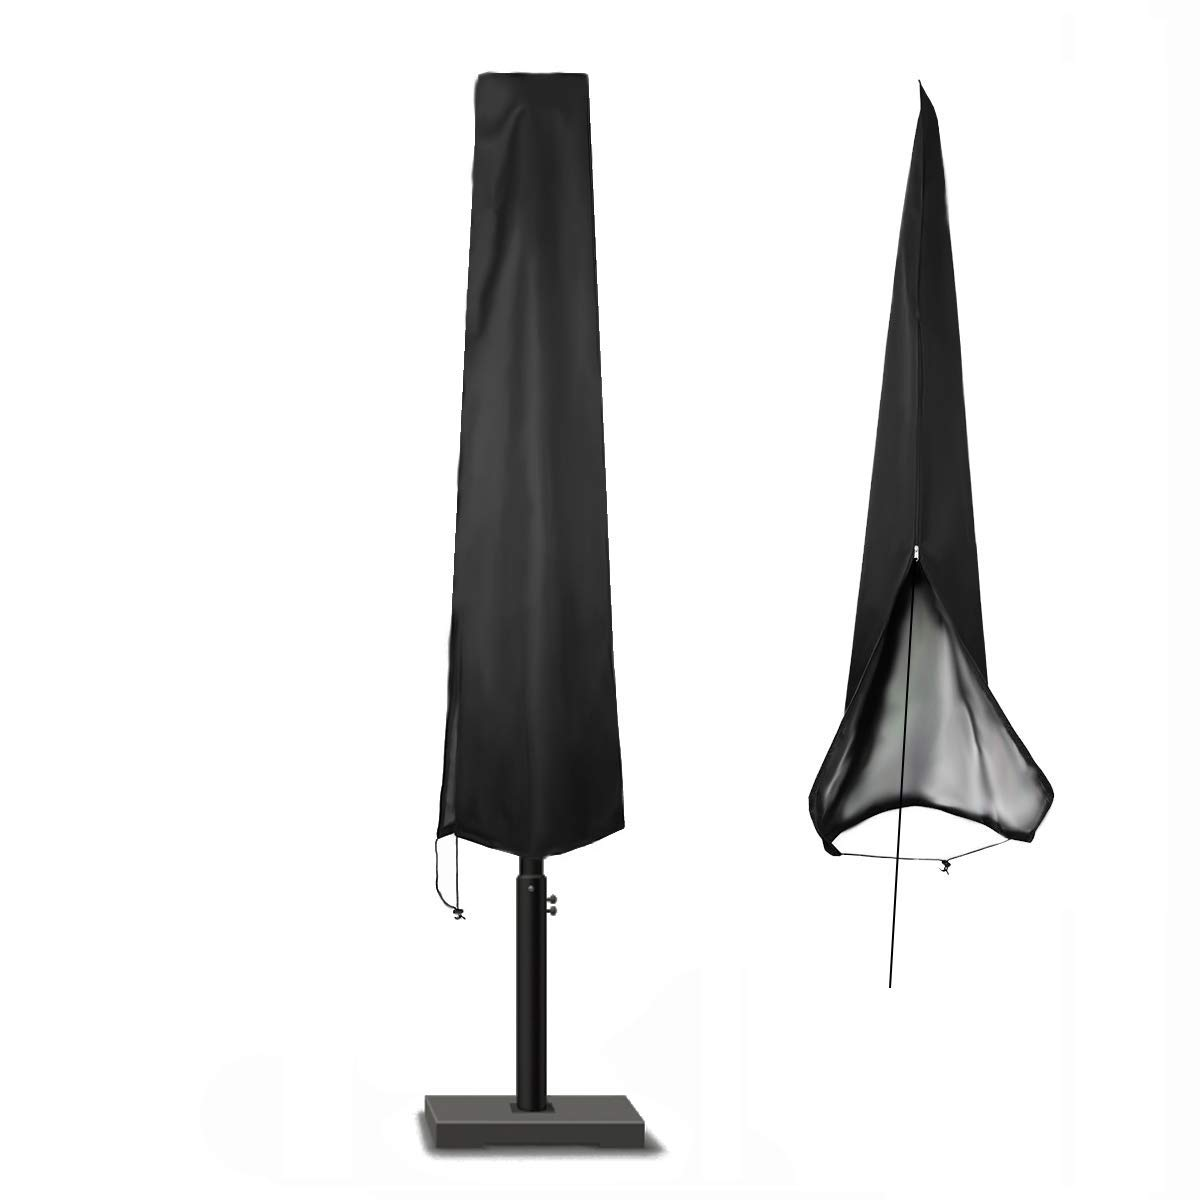 POMER Patio Outdoor Market Patio Umbrella Cover 7-11 Ft Outdoor Umbrellas, 420D Water Resistant Polyester Fabric, Black